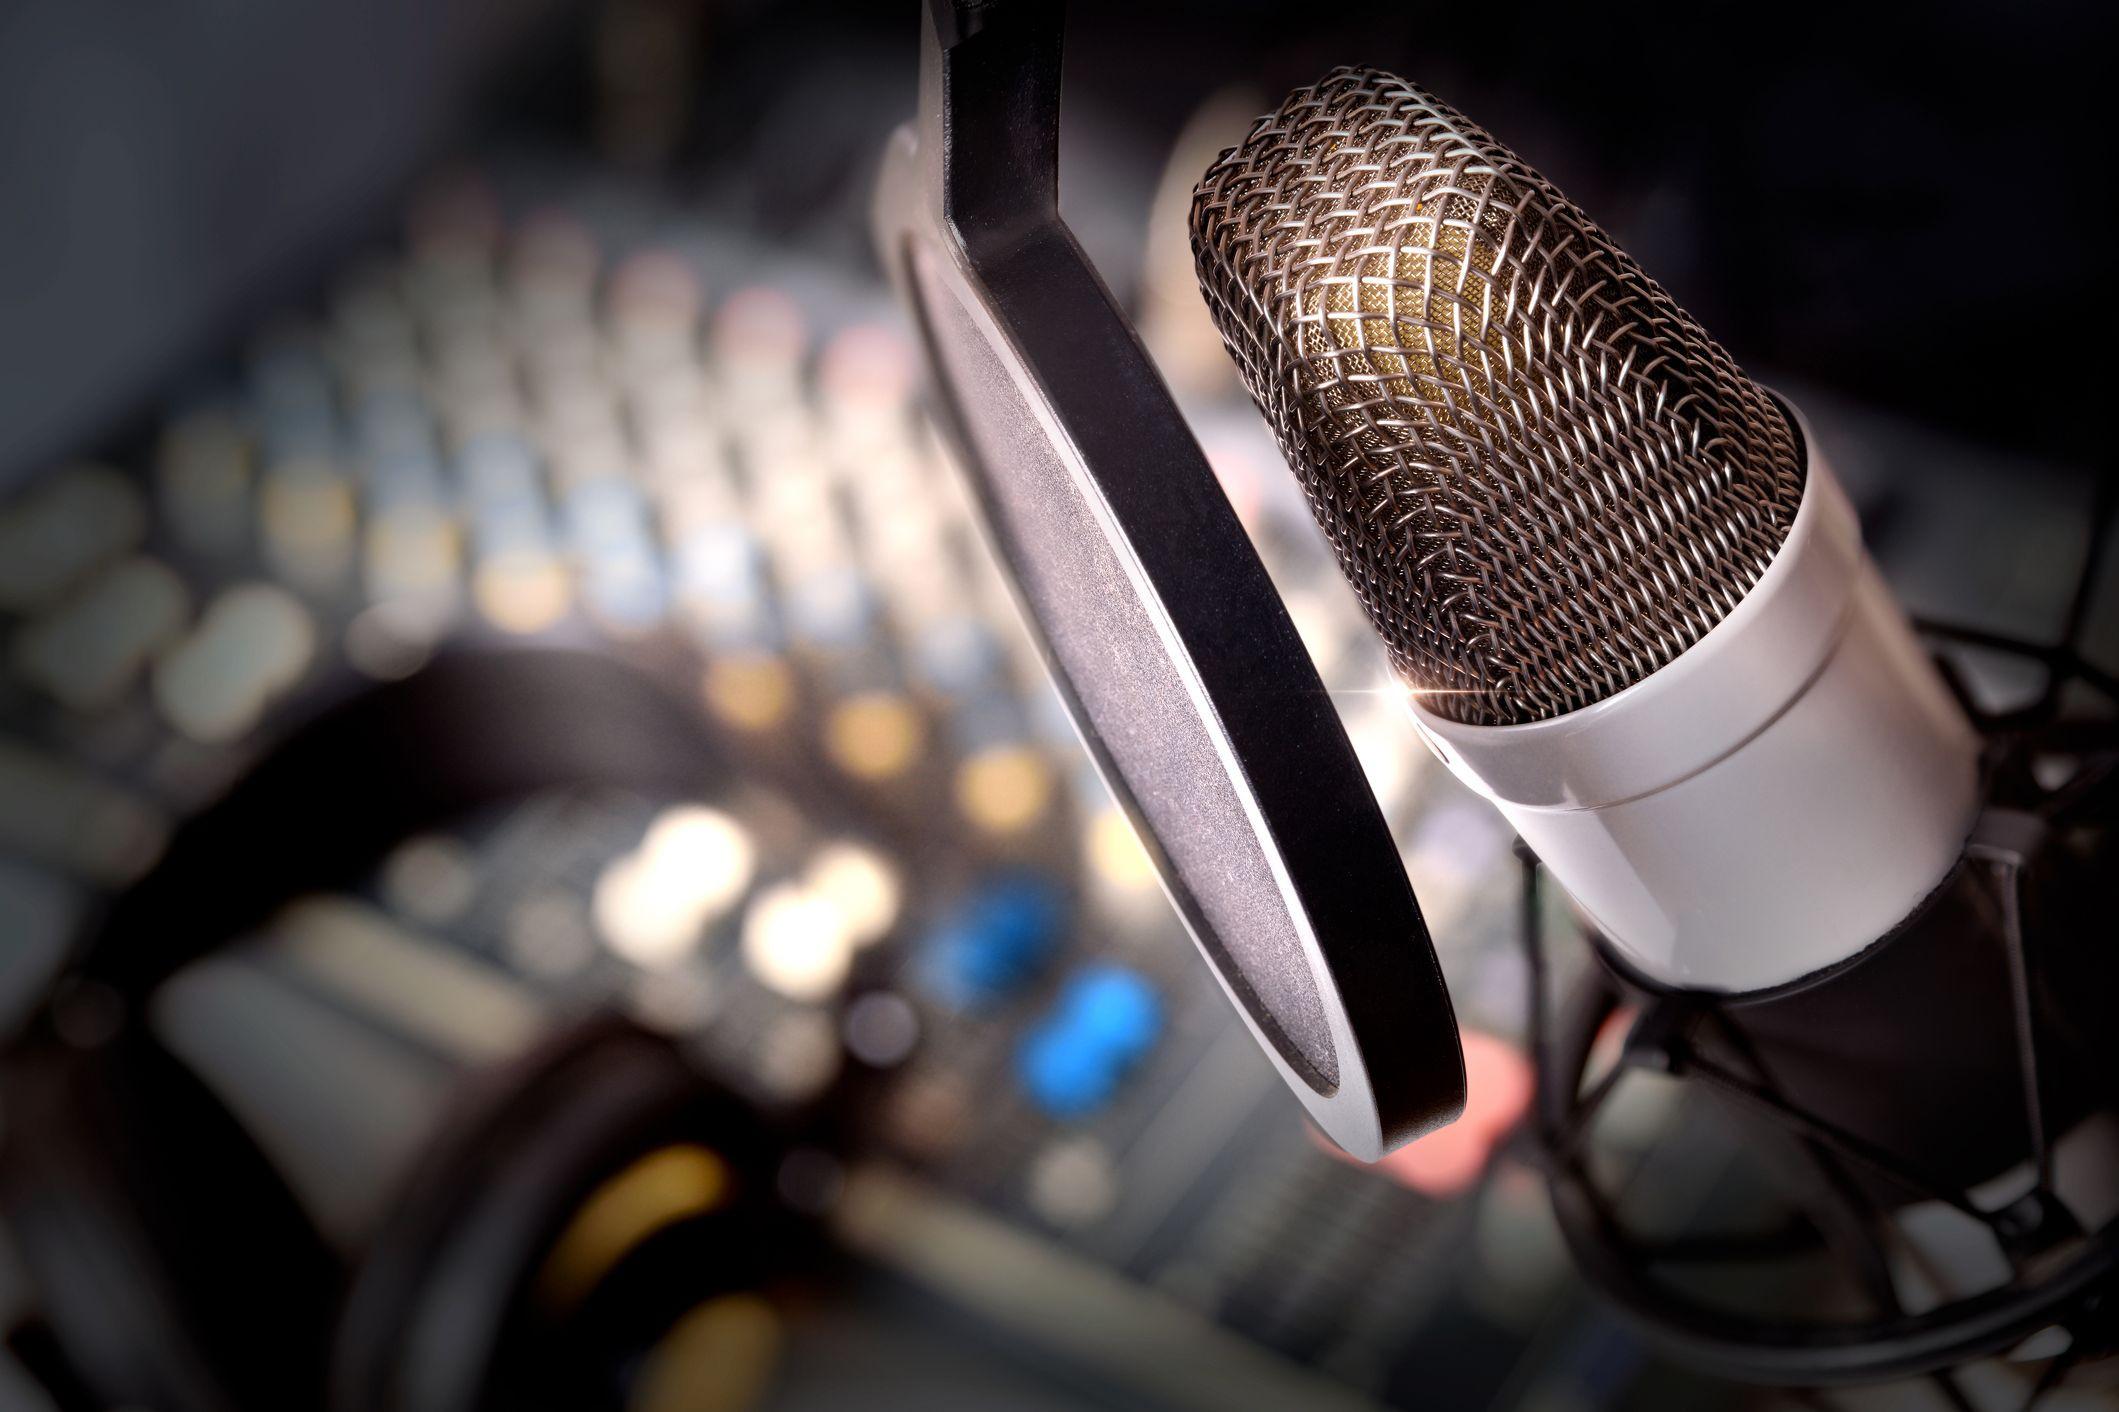 Rádio recusa passar música natalícia por considerá-la machista